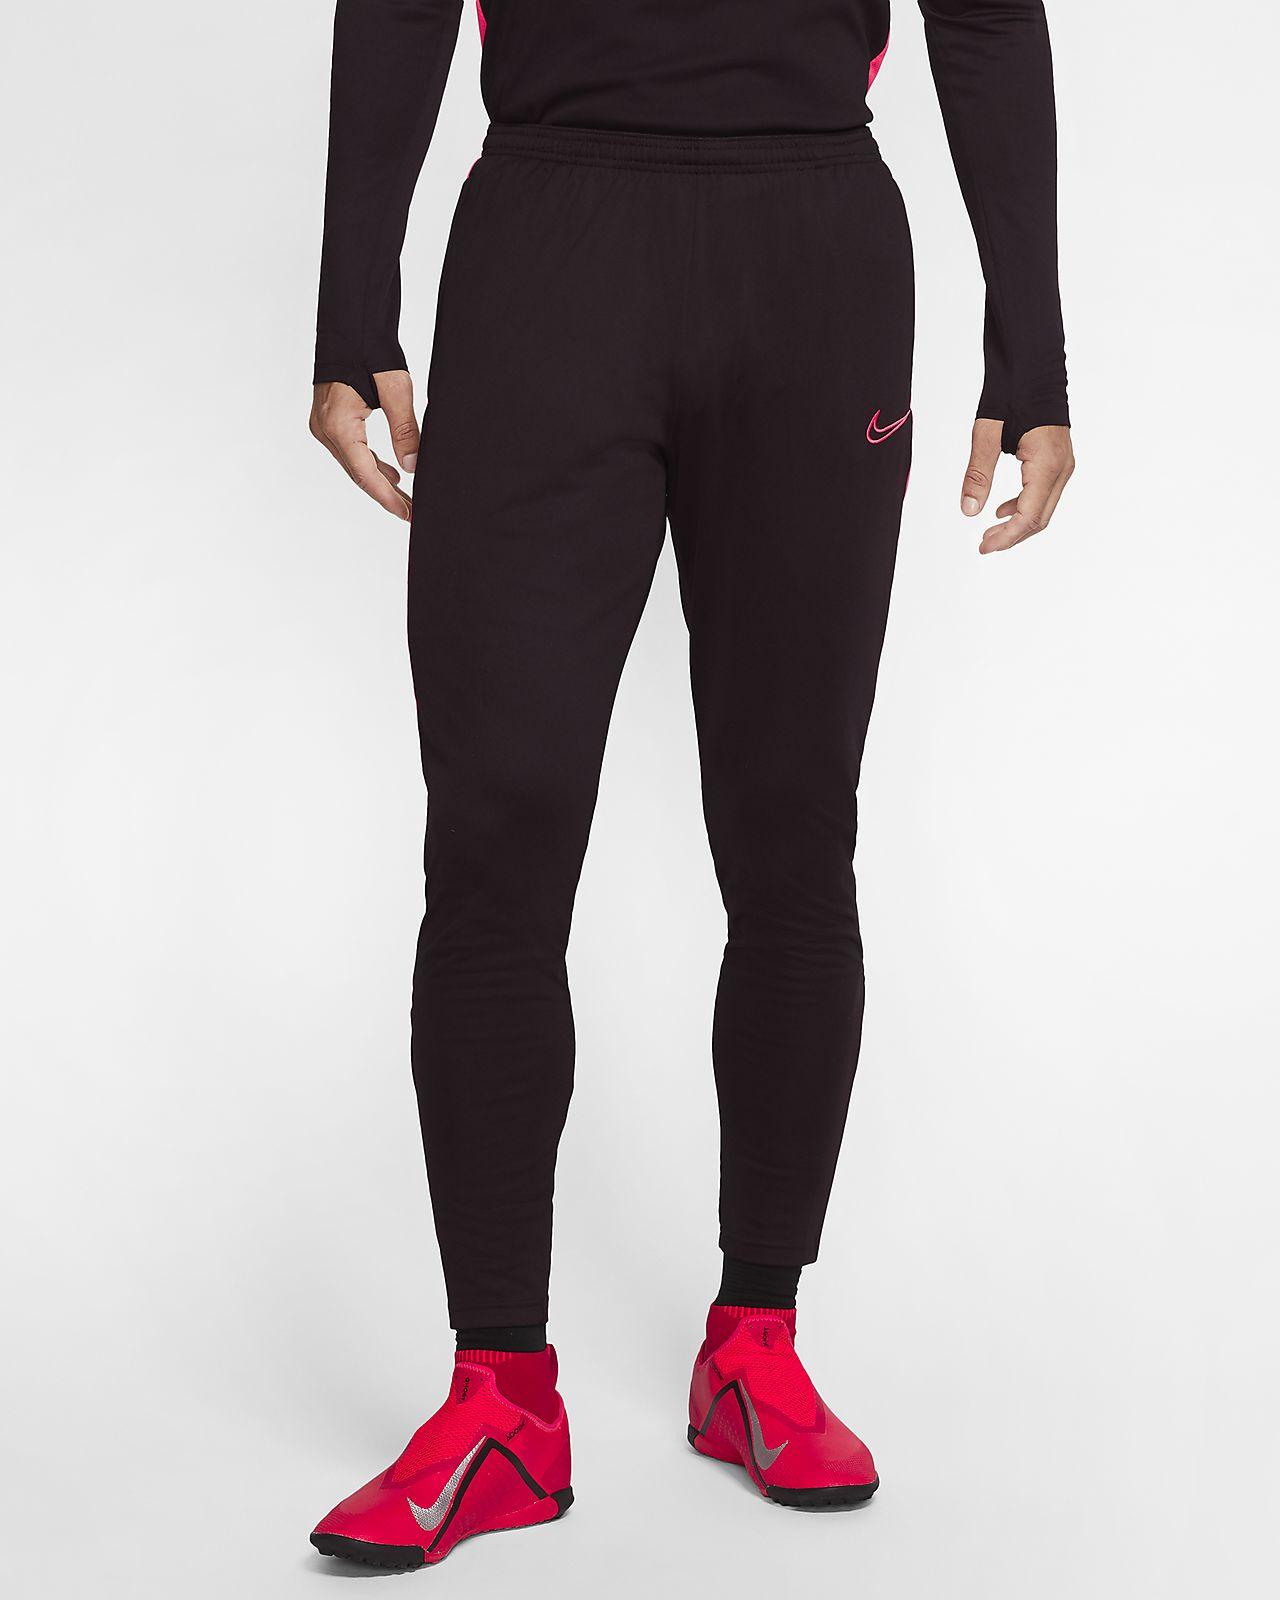 Nike Dri-FIT Academy Pantalón de fútbol - Hombre